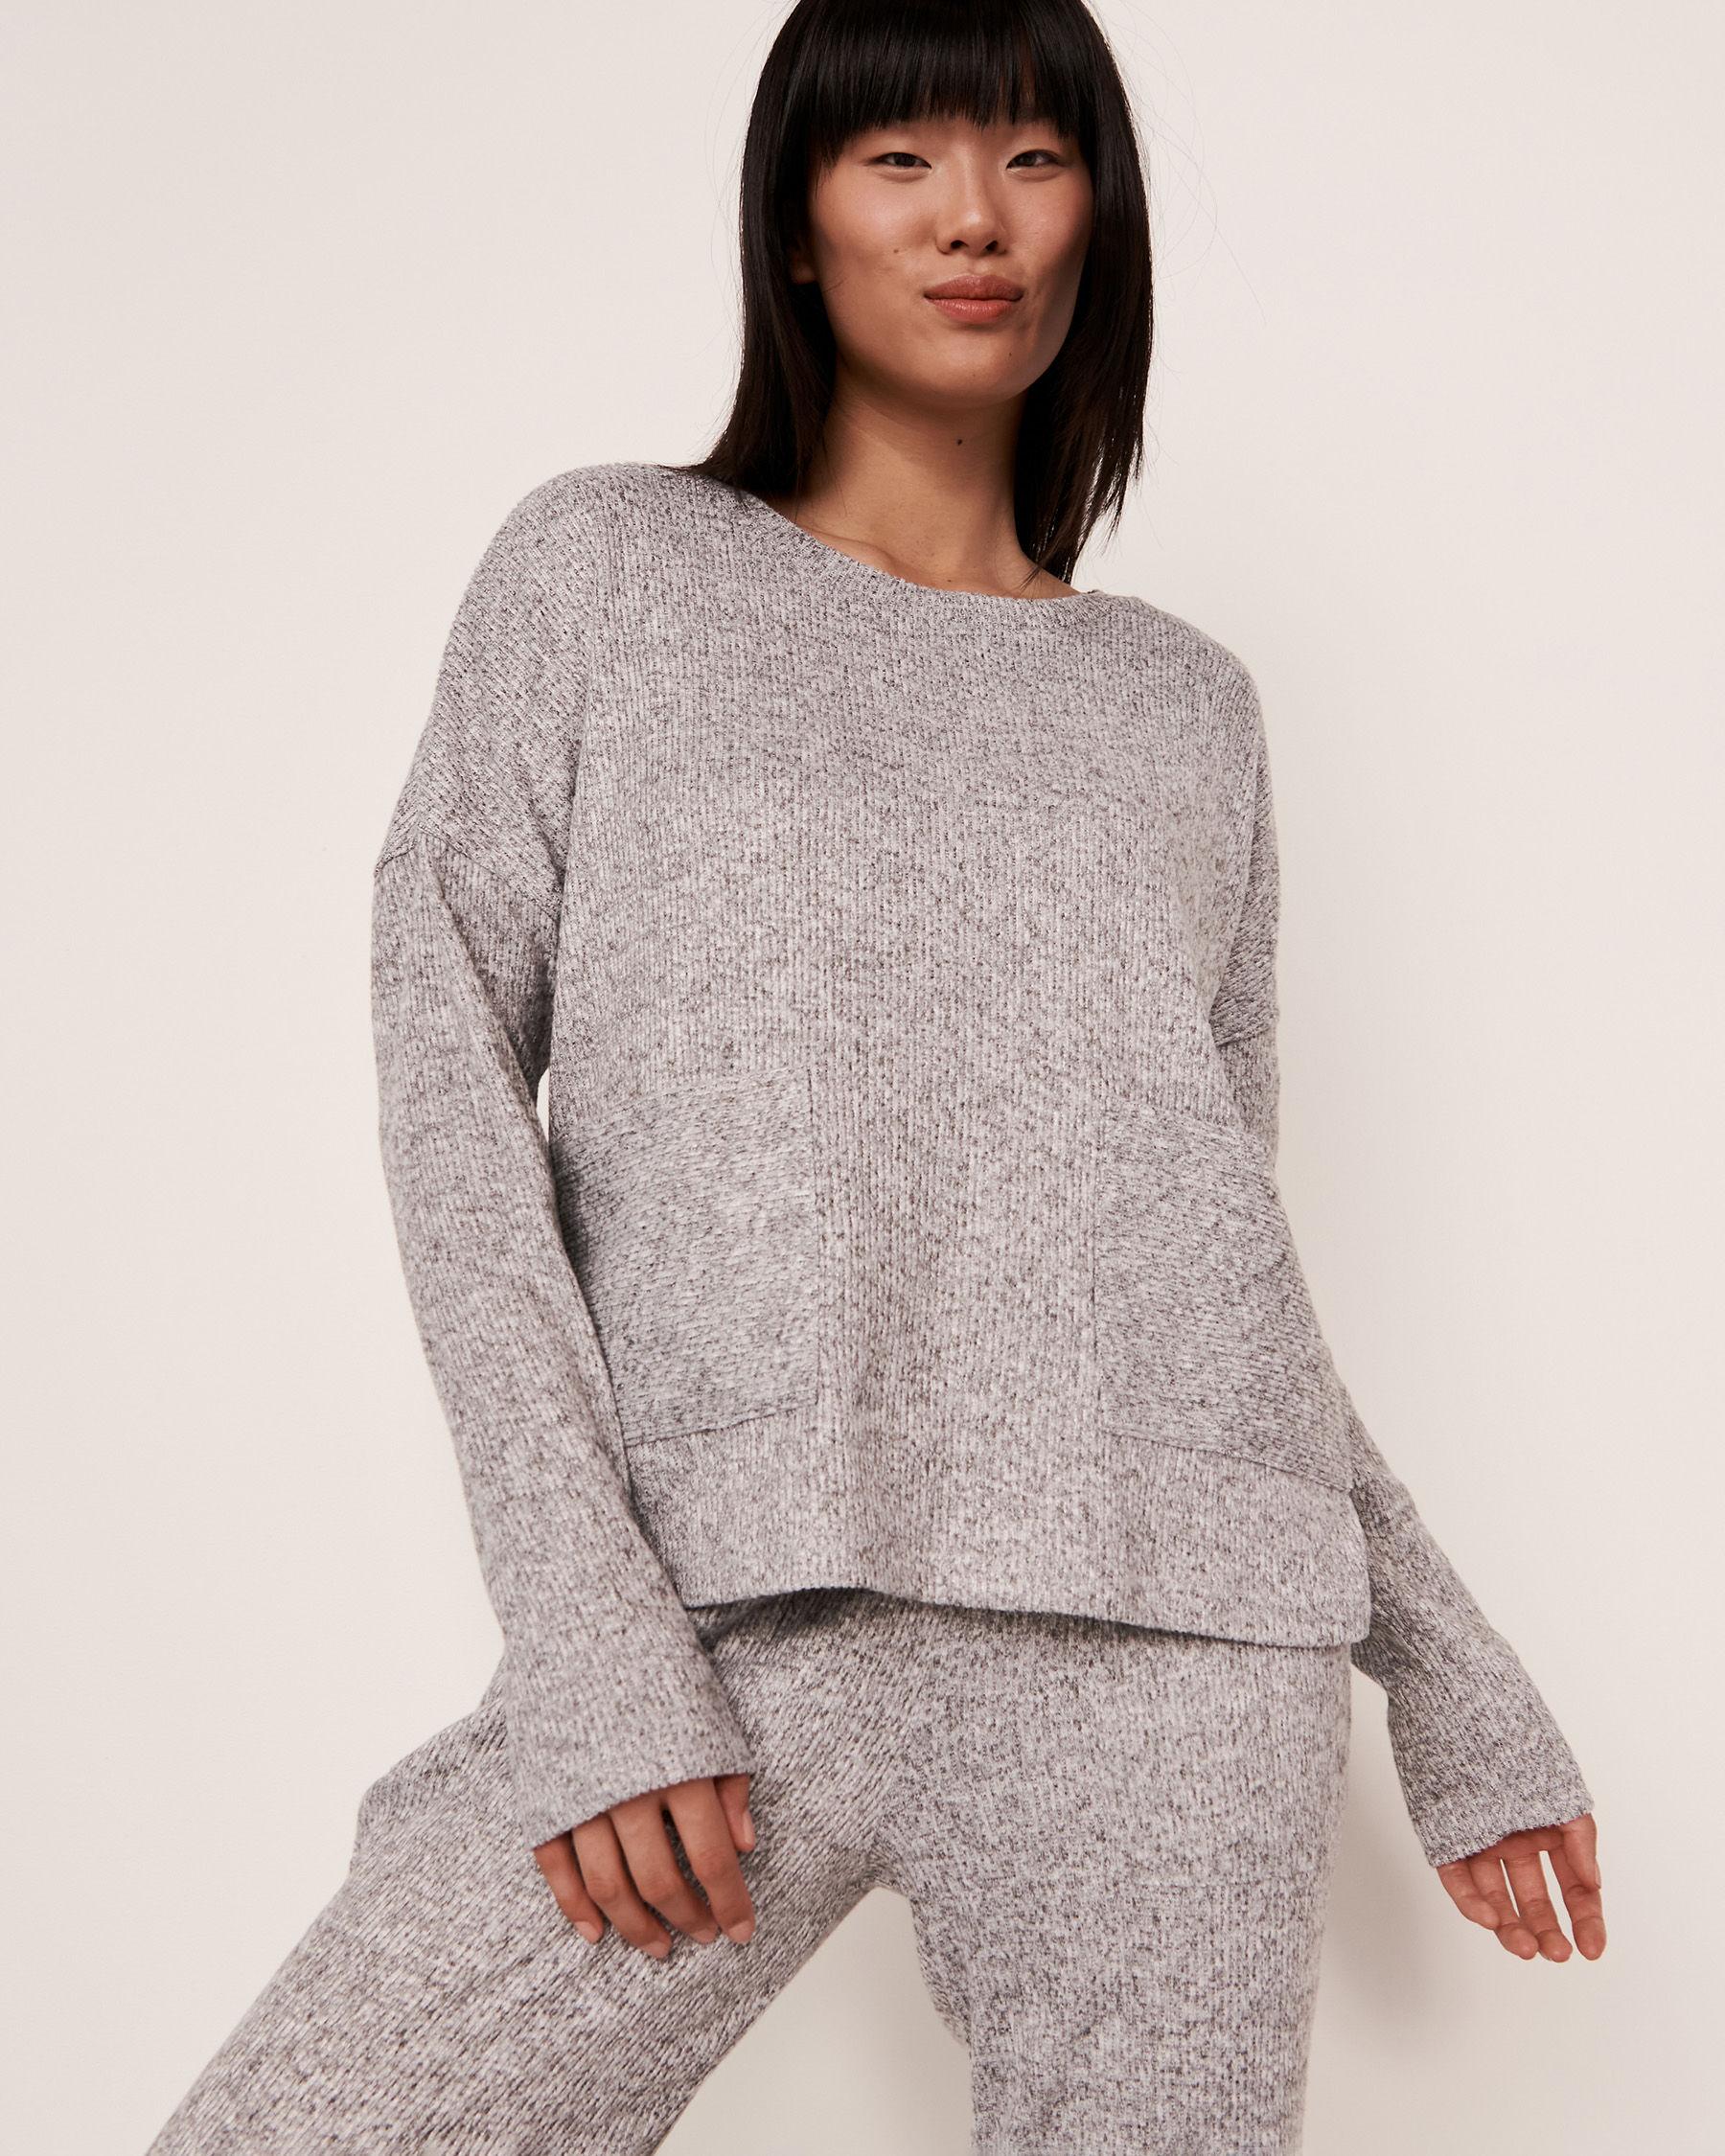 LA VIE EN ROSE Ribbed Long Sleeve Shirt Grey 50100015 - View3